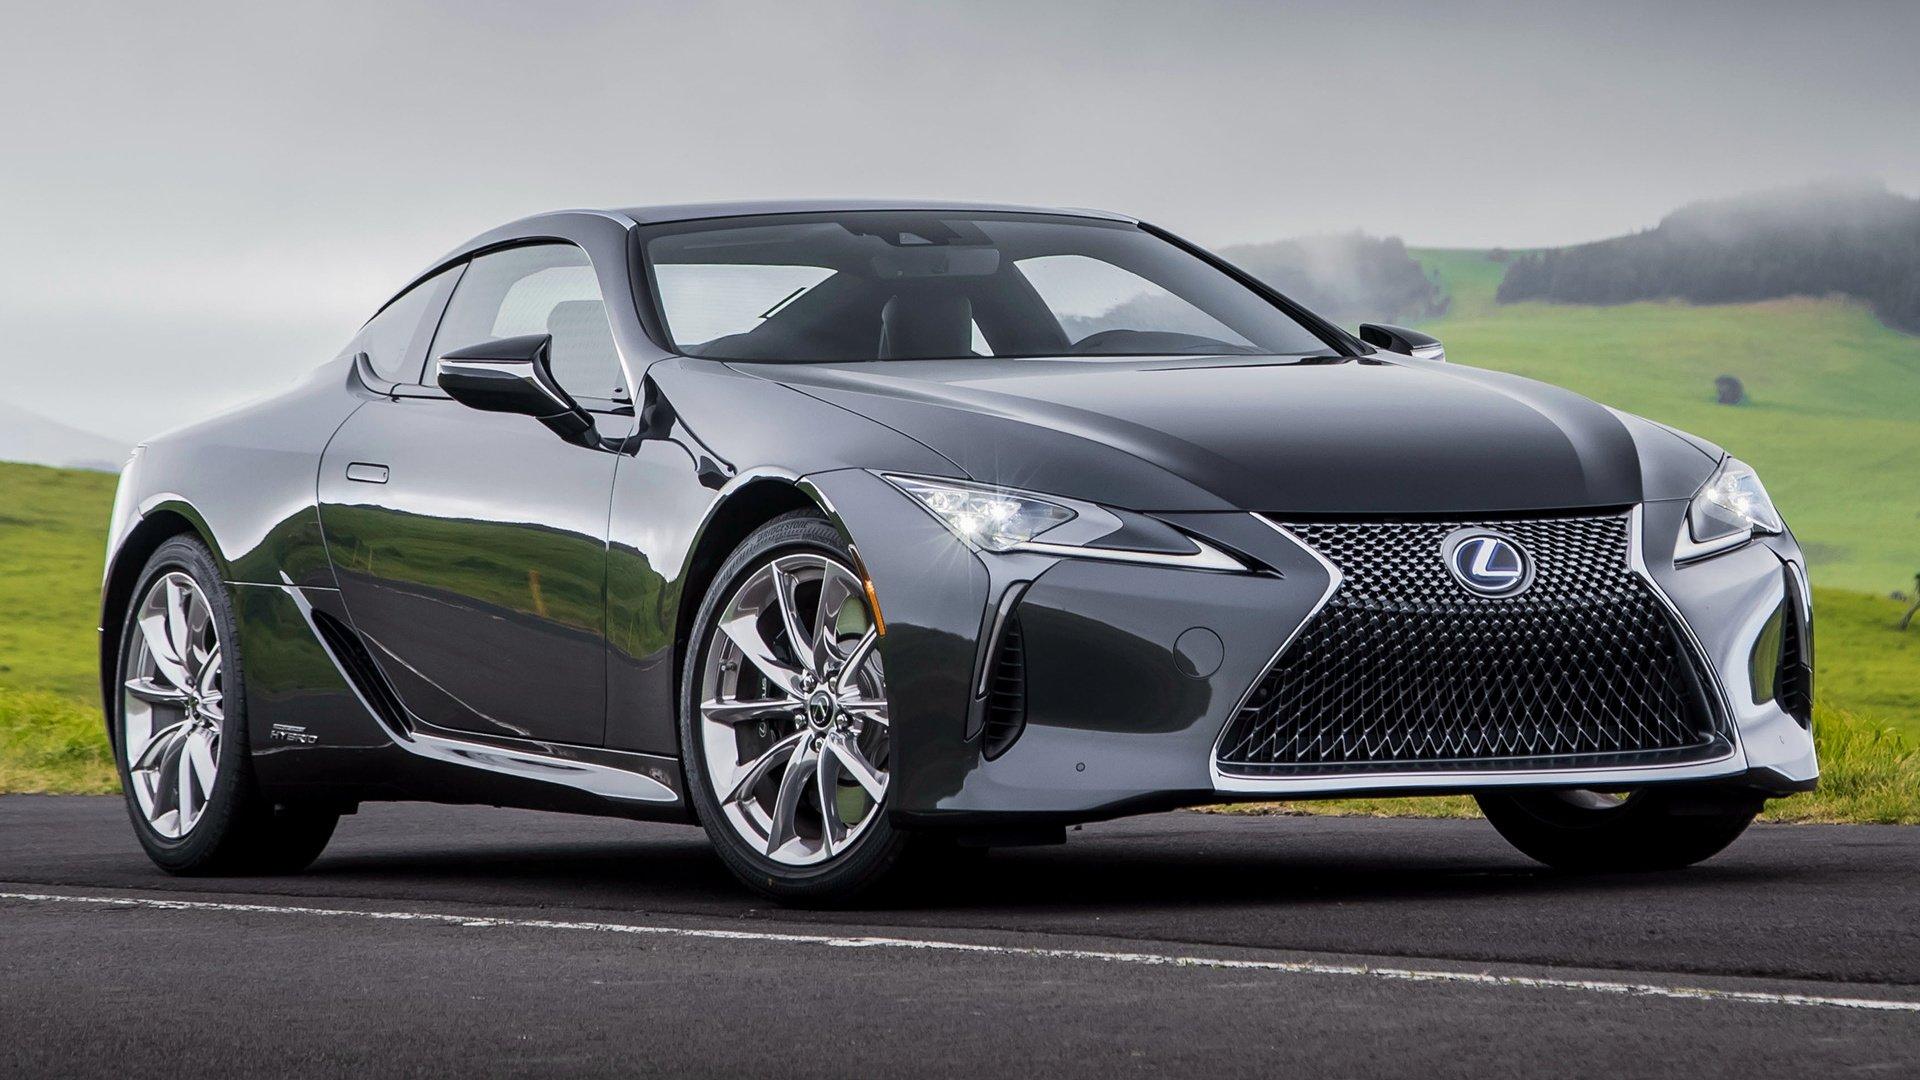 2018 Lexus Lc 500h Hybrid Car Fondo De Pantalla Hd Fondo